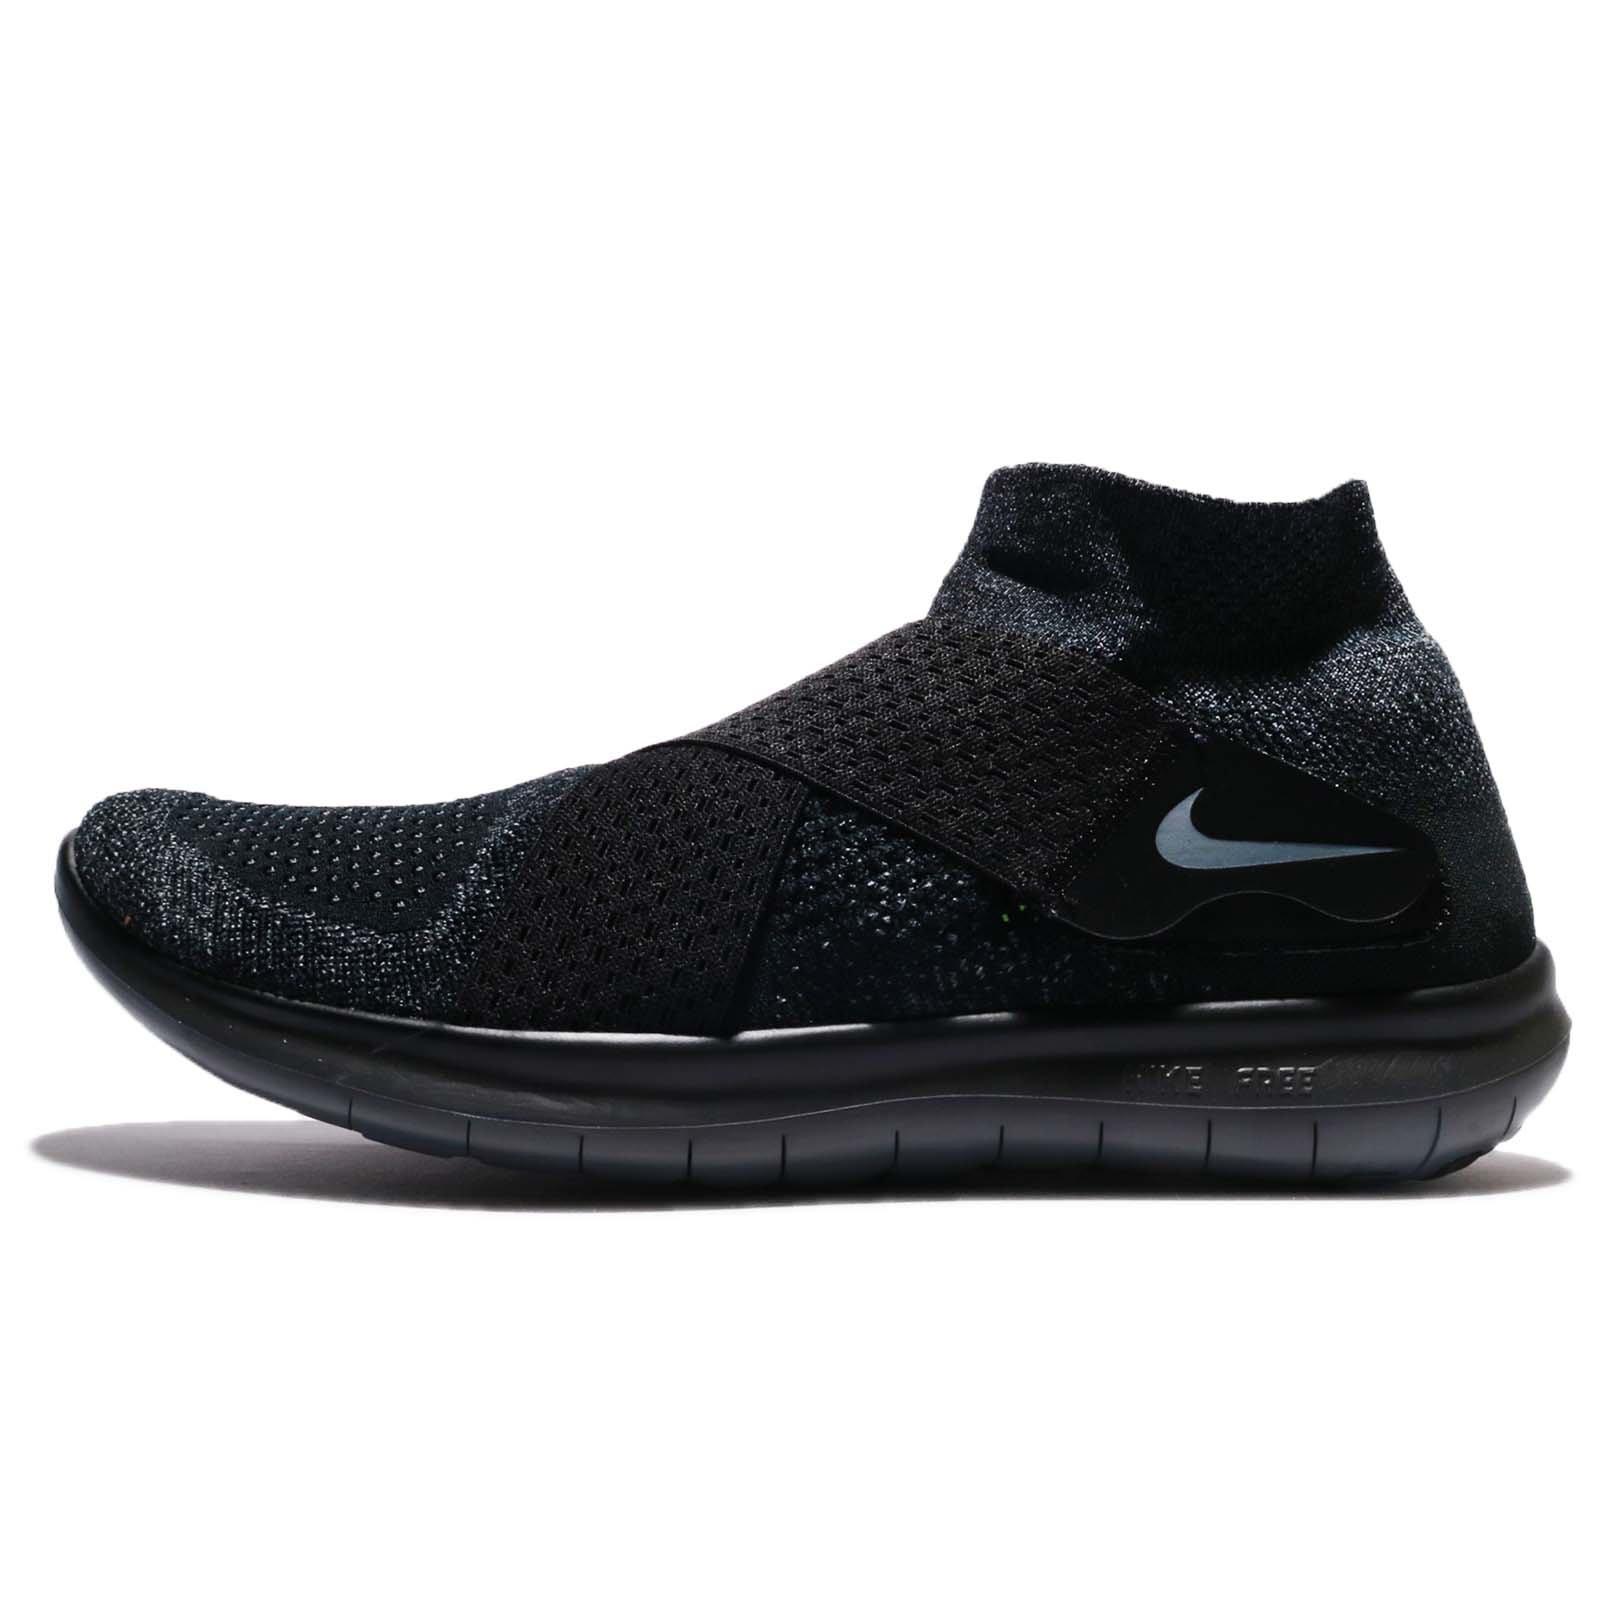 save off d8597 7f702 Galleon - Nike Men s Free RN Motion Flyknit 2017 Running Shoe Black Dark  Grey-Anthracite-Volt 10.0